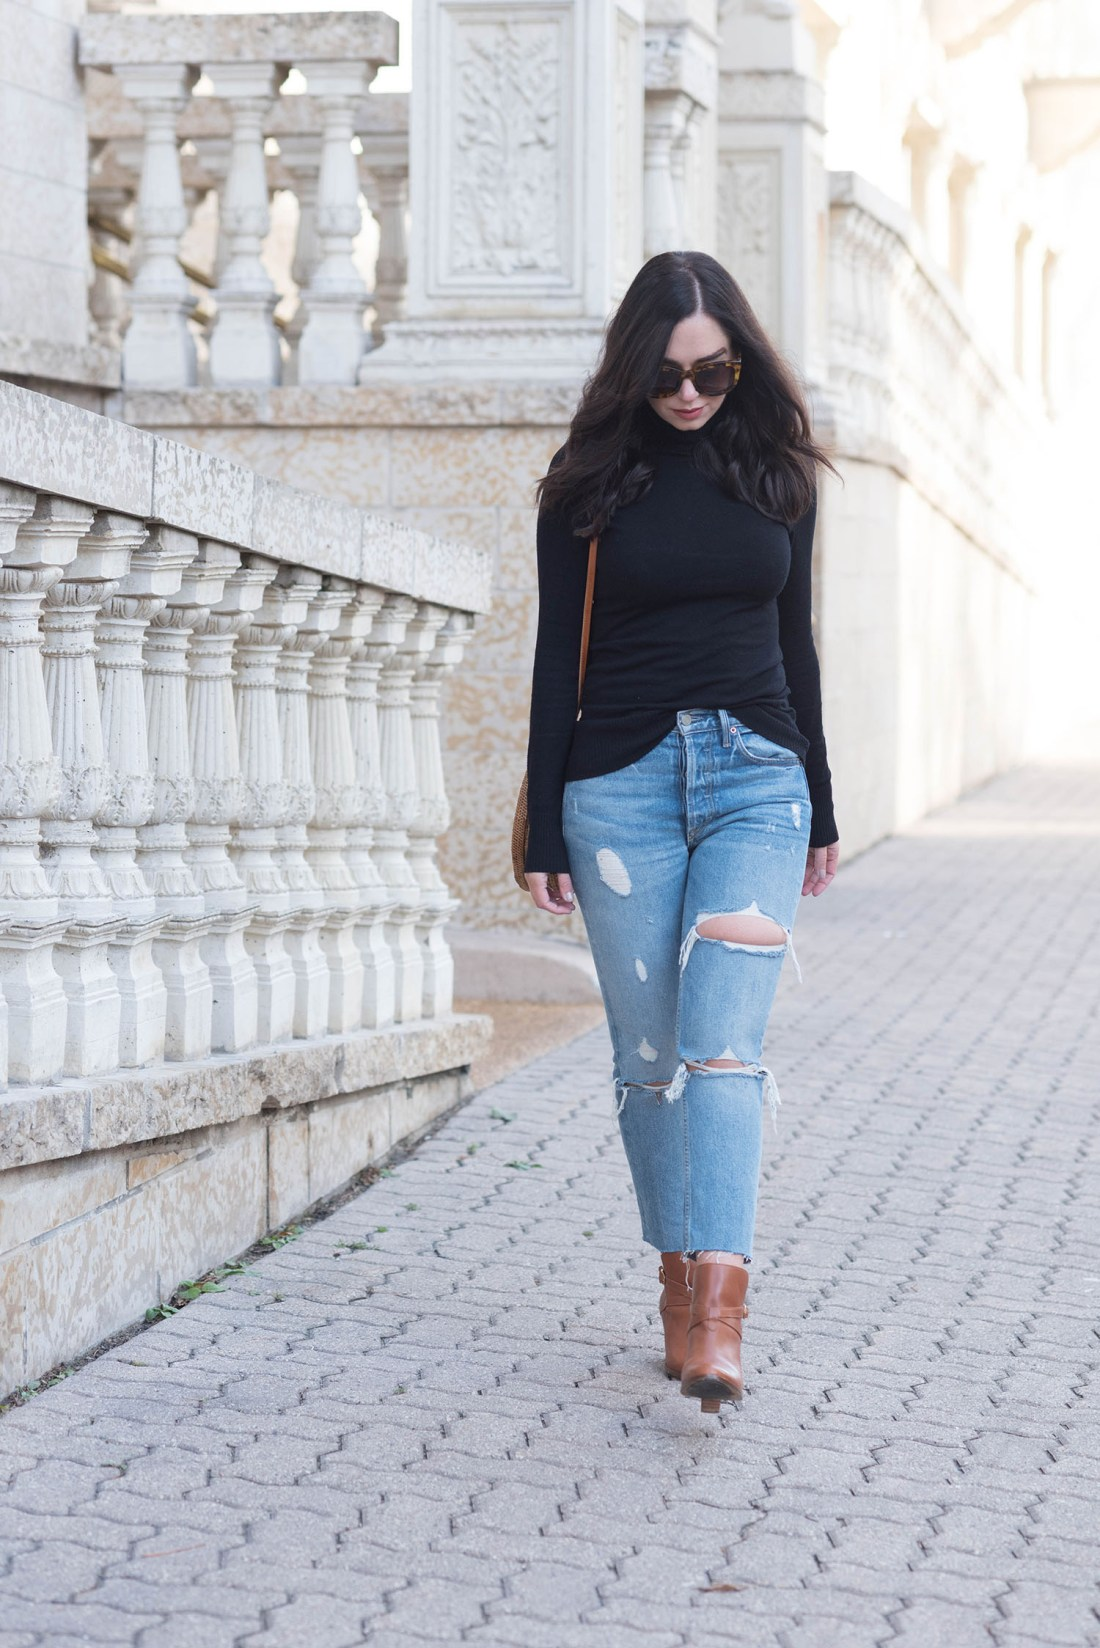 Fashion blogger Cee Fardoe of Coco & Vera walks by Fort Garry Place in Winnipeg wearing Grlfrnd jeans and Sezane ankle boots